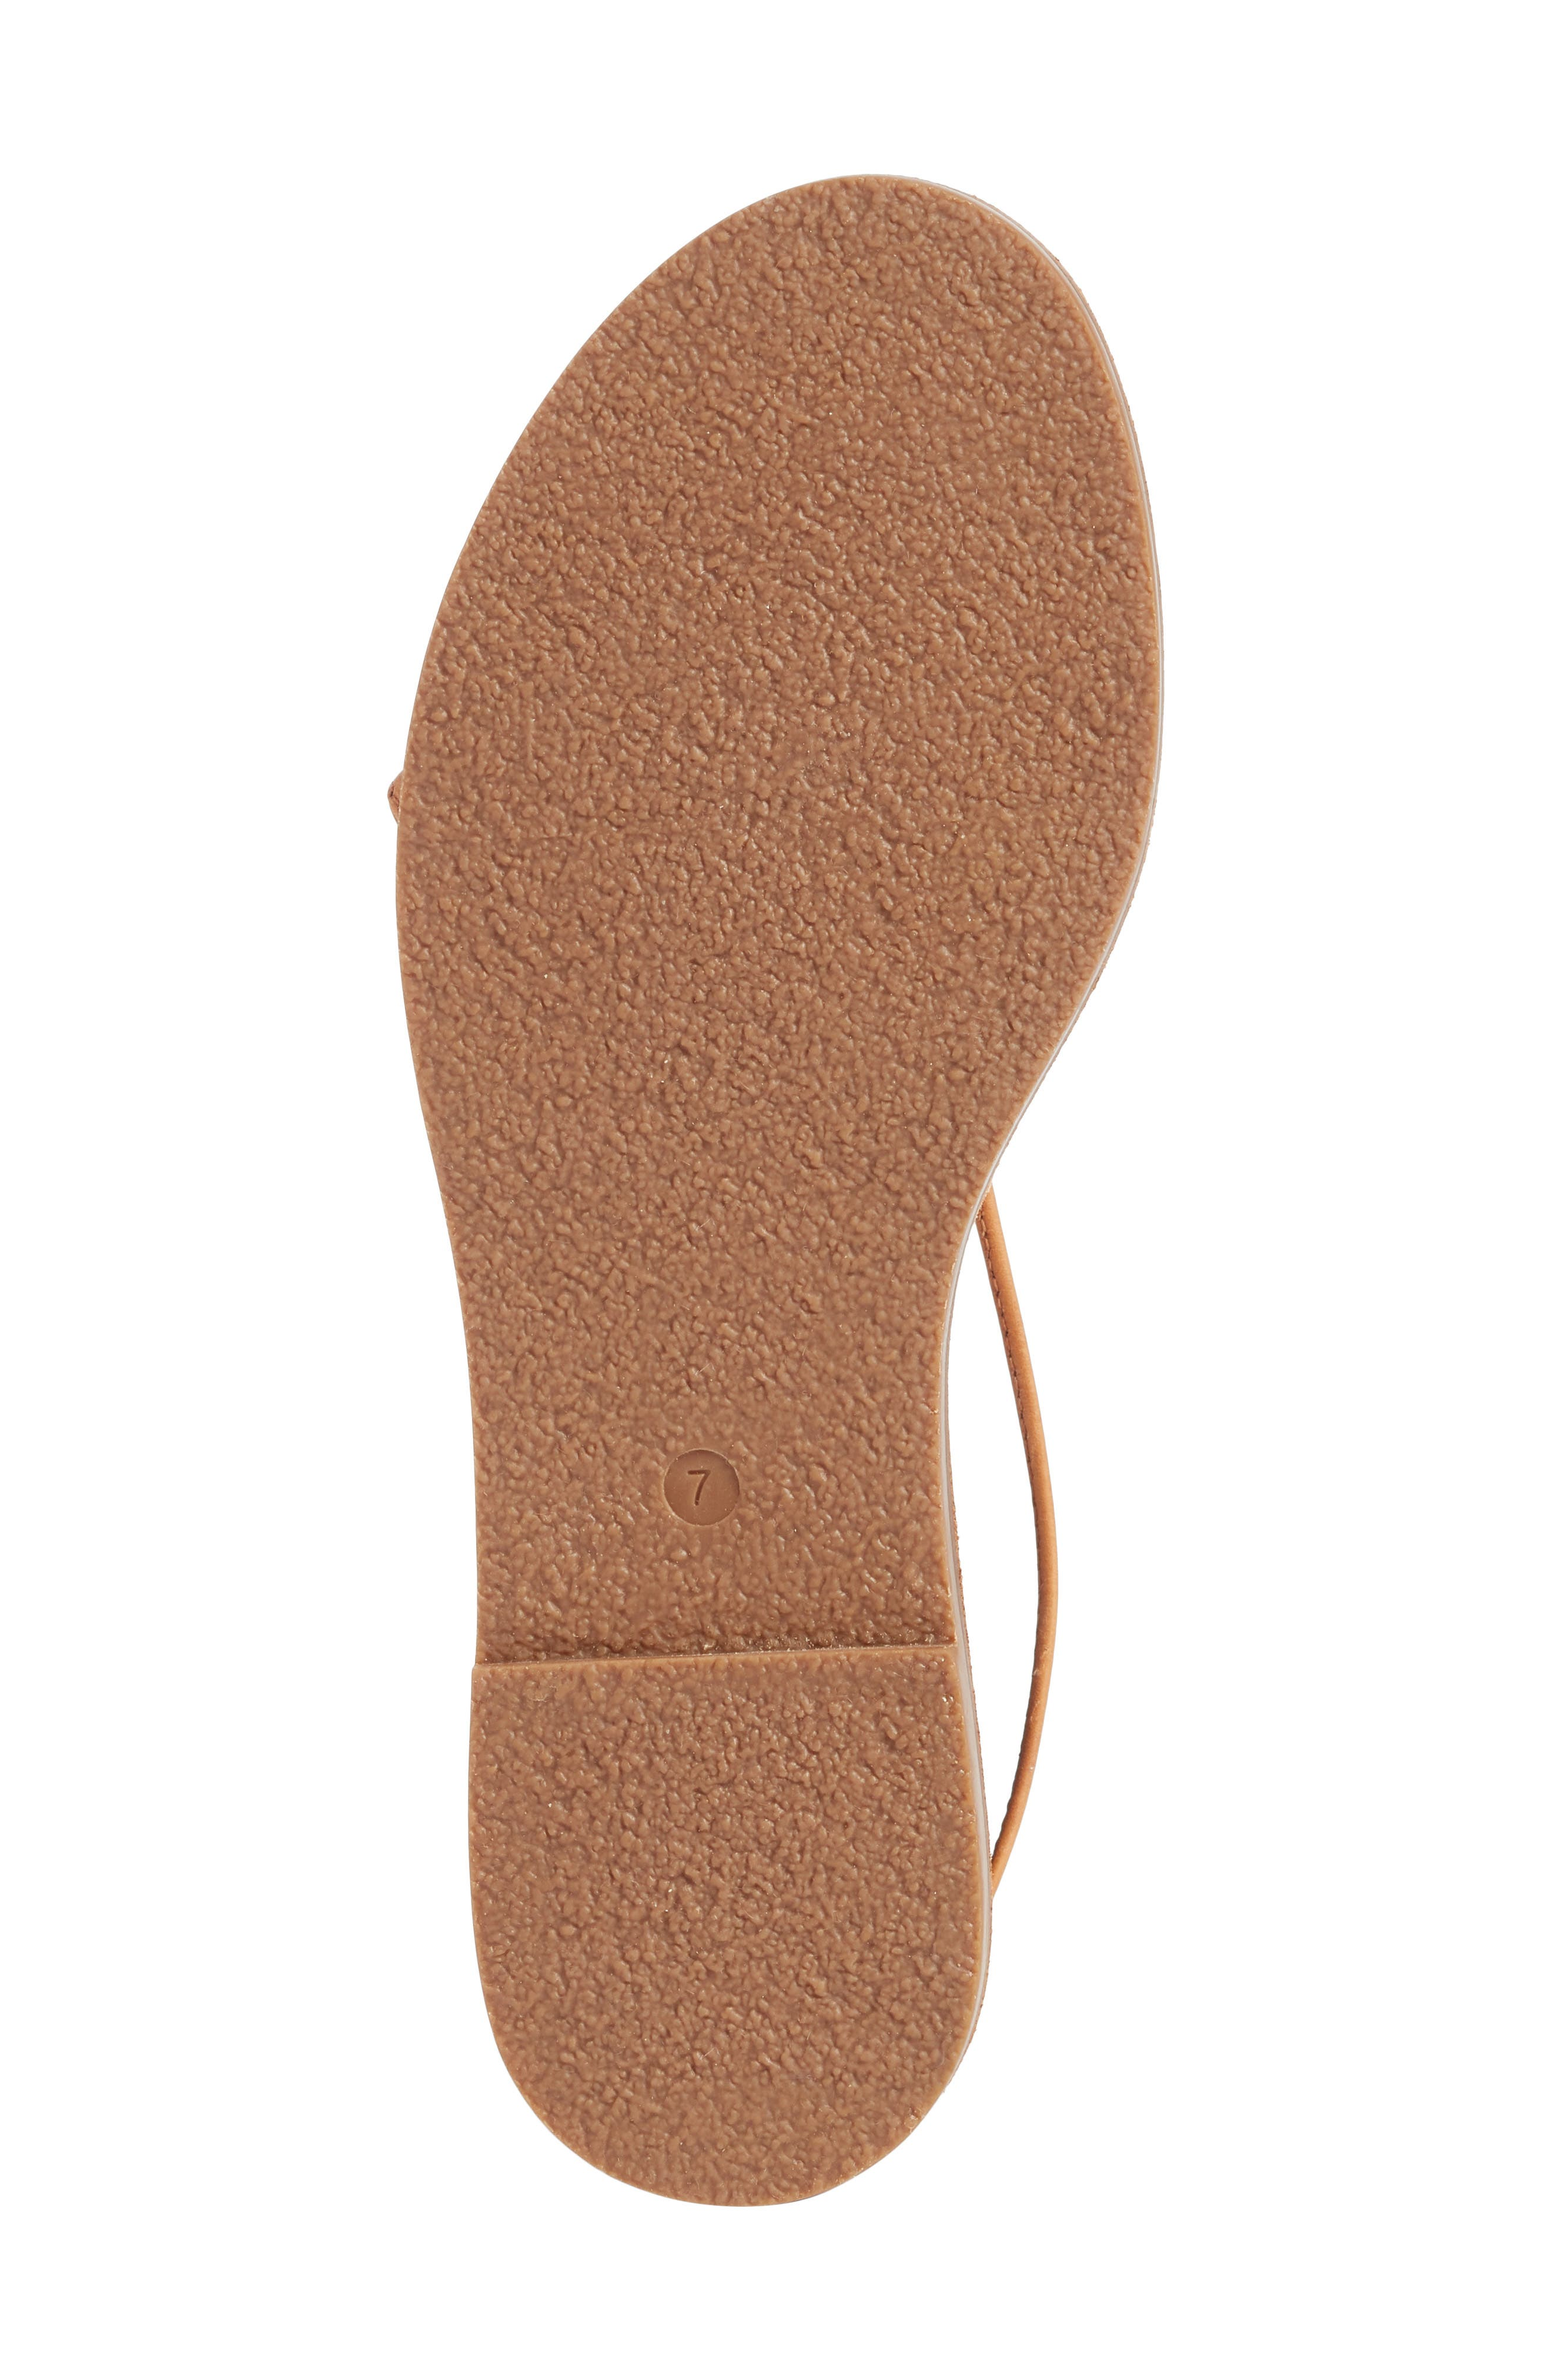 The Boardwalk Lace-Up Sandal,                             Alternate thumbnail 6, color,                             DESERT CAMEL LEATHER